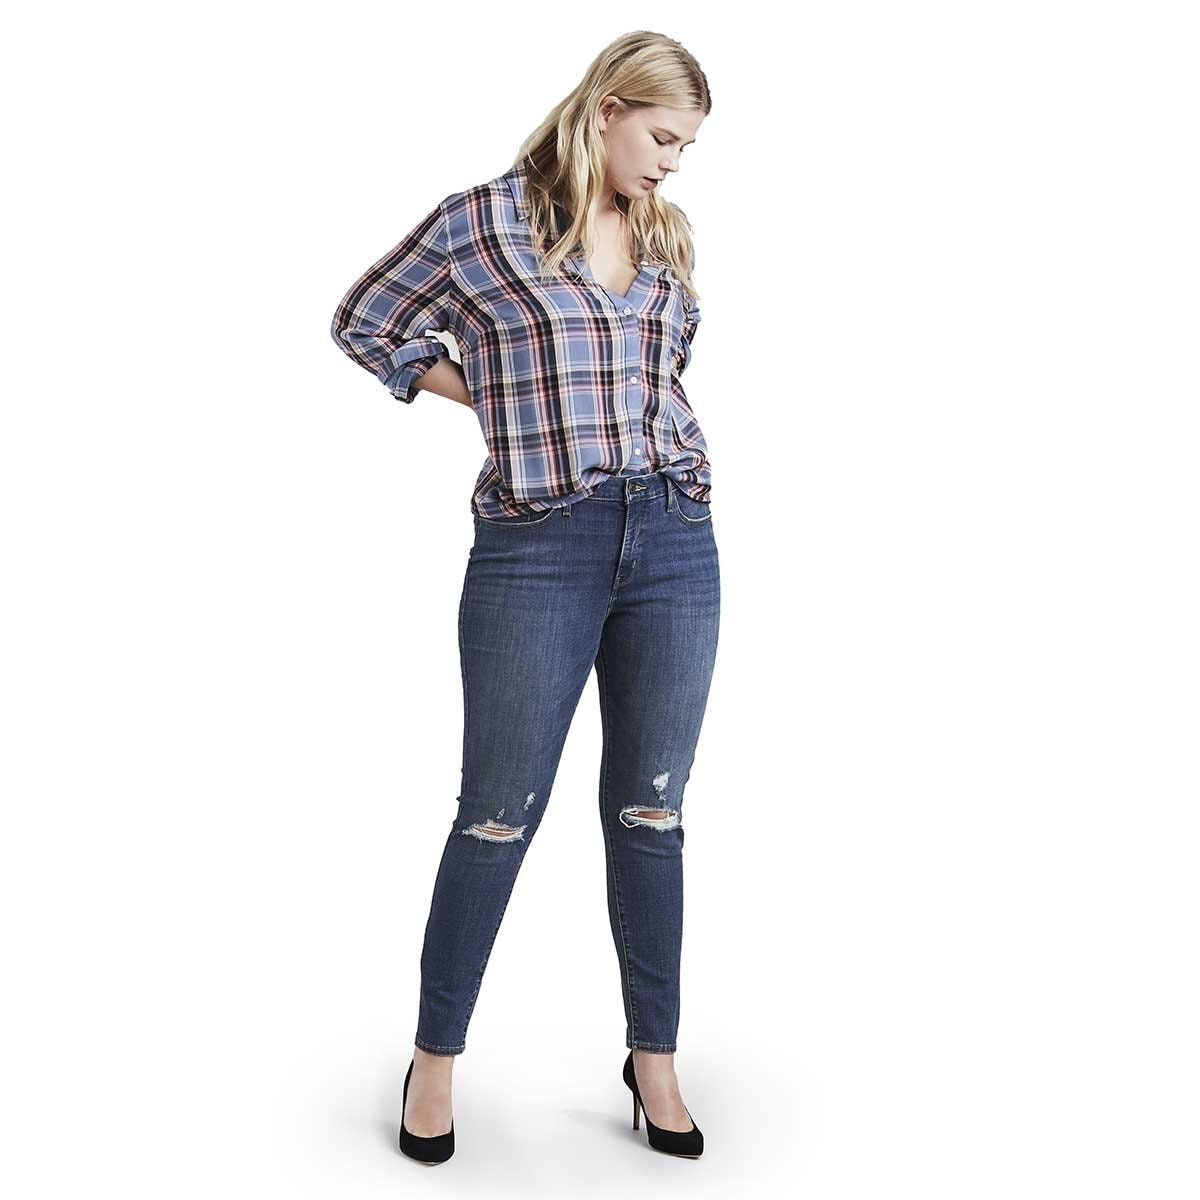 Jeans 310 Pl Shping Spr Skinny Levis Plus